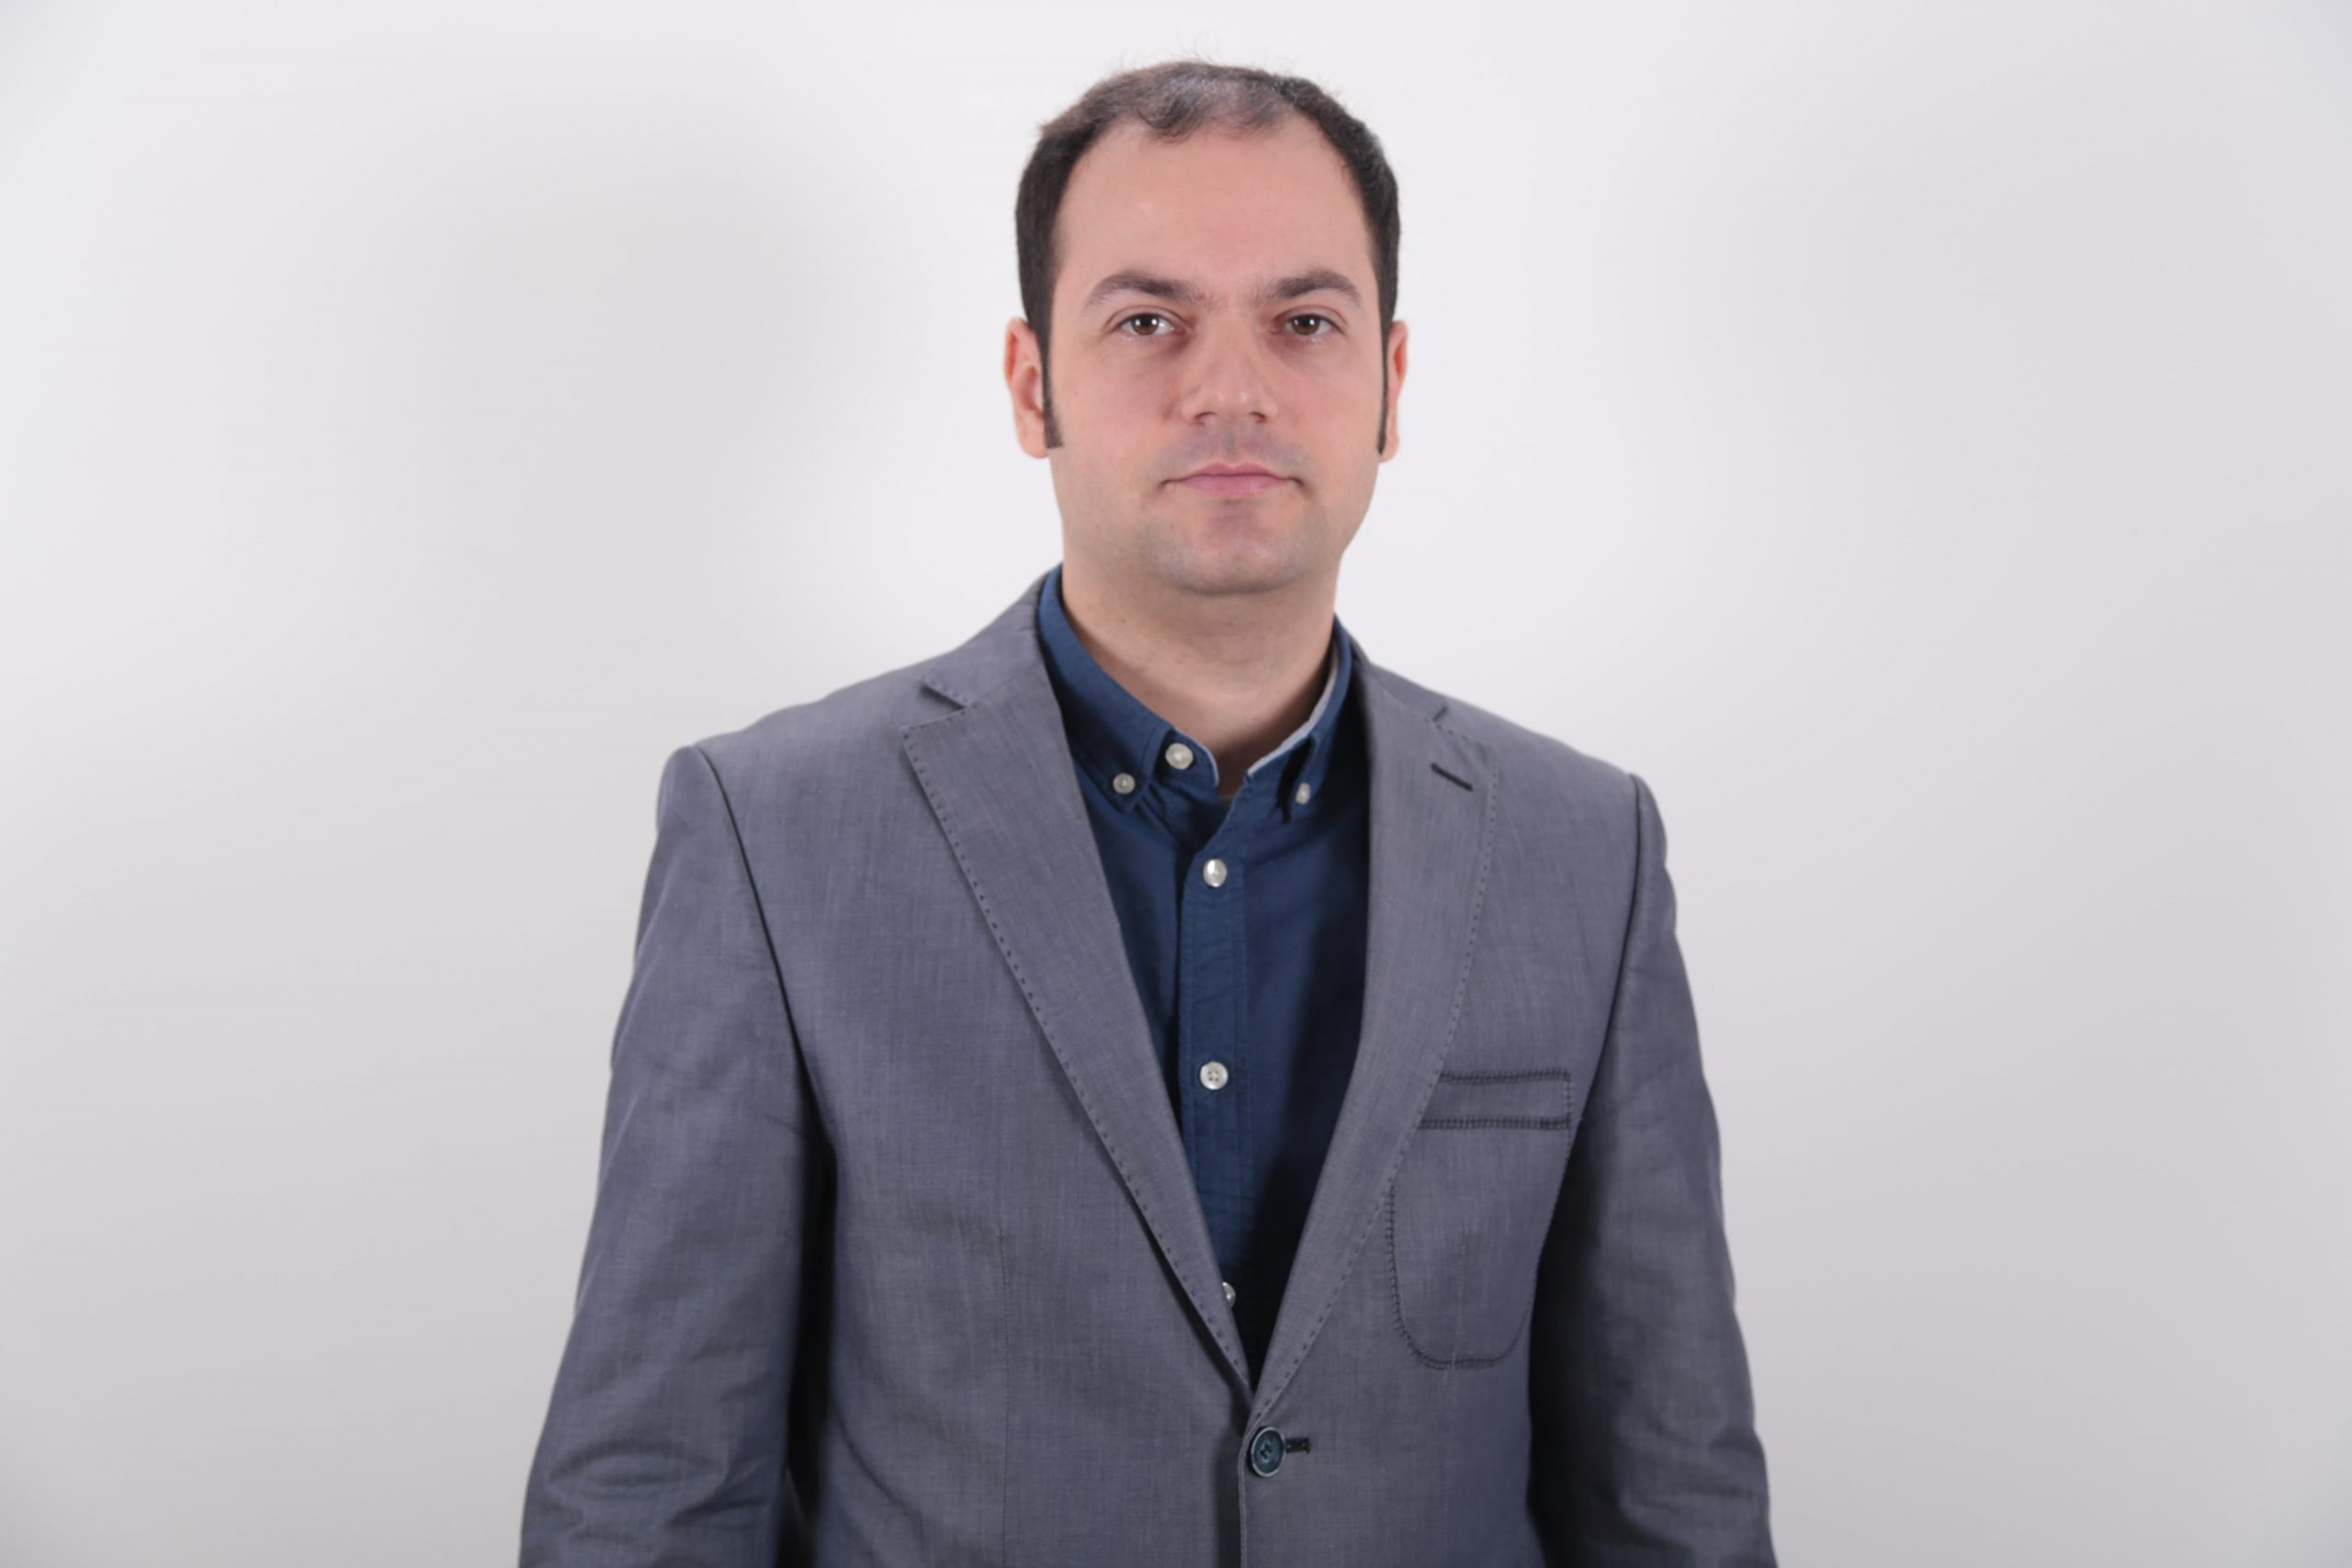 Valdrin Haxhiu